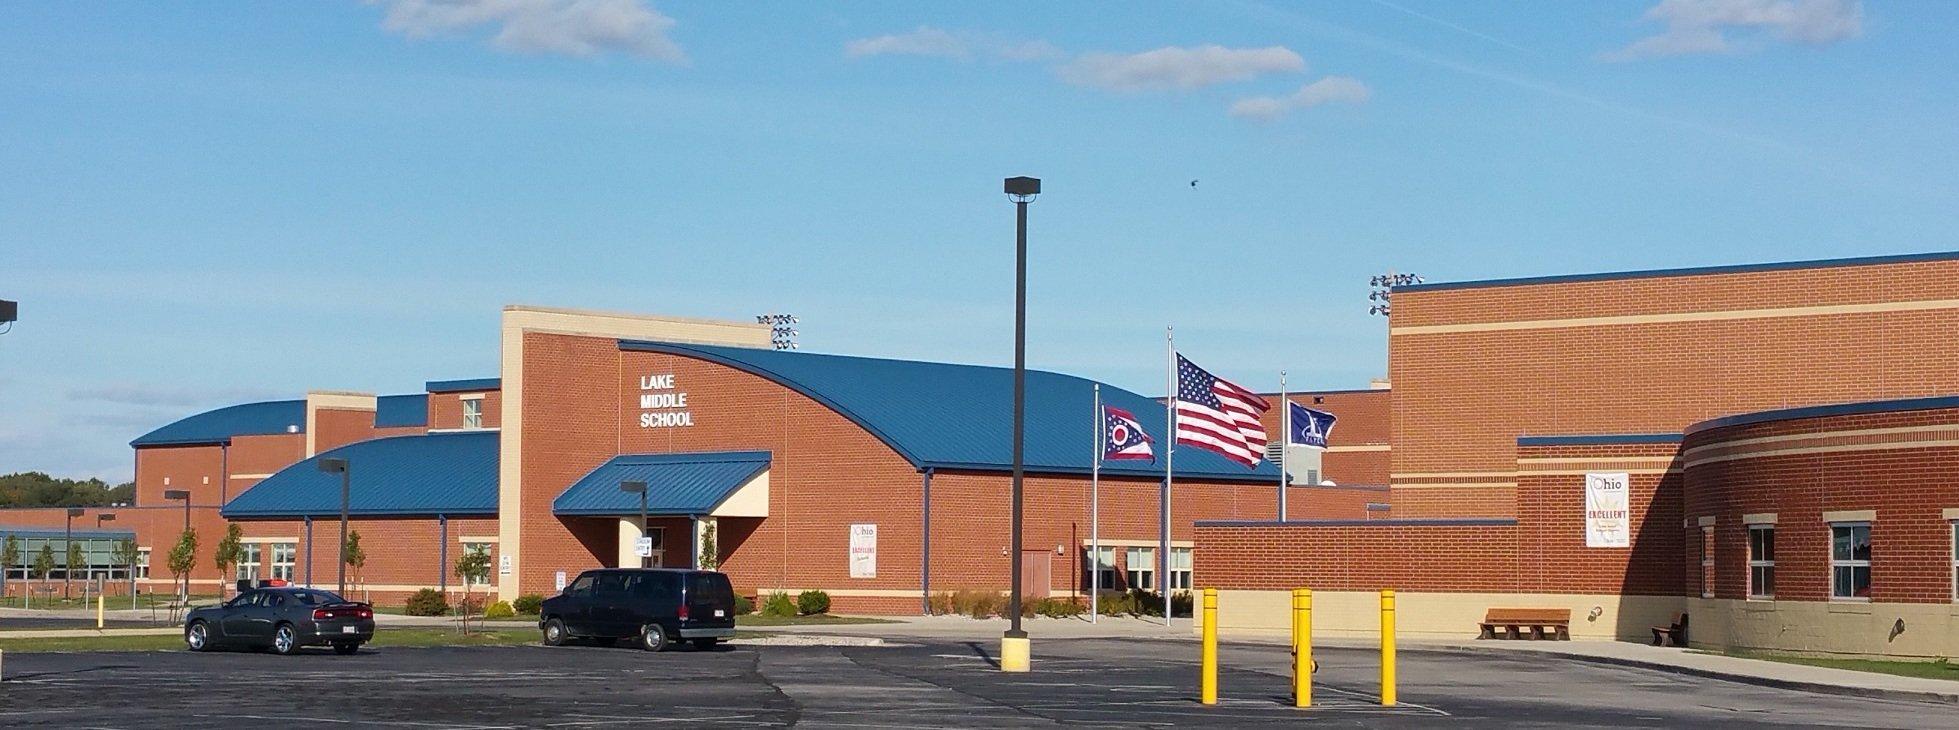 Walbridge Ohio School System